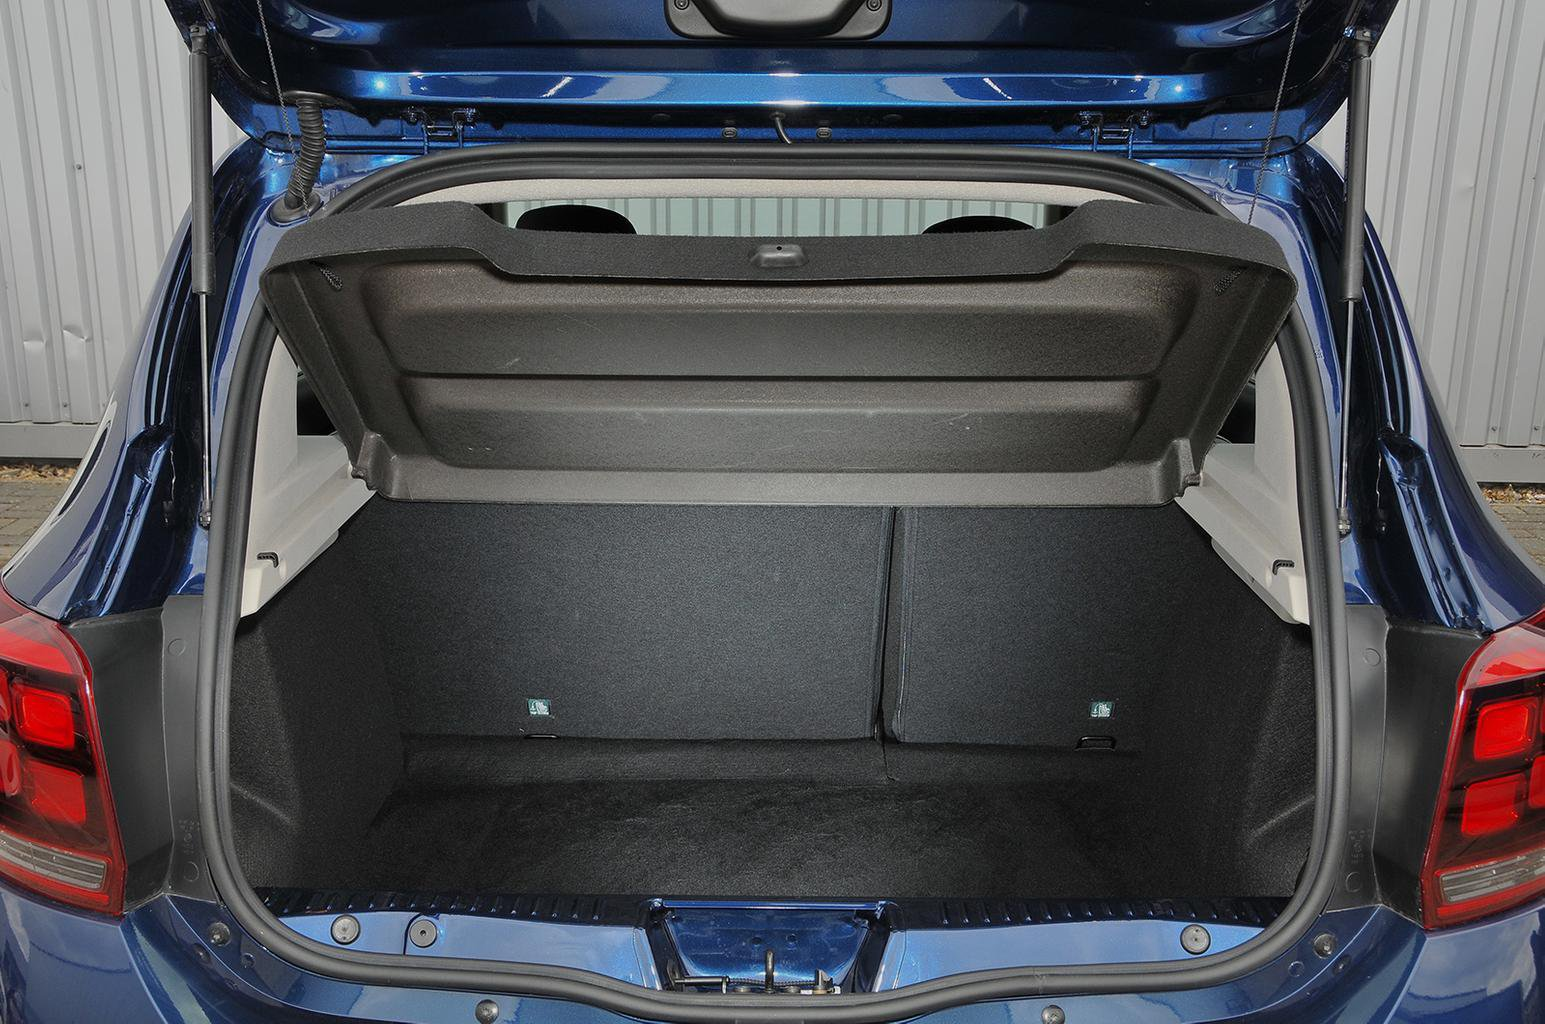 Used Dacia Sandero Stepway 13-present